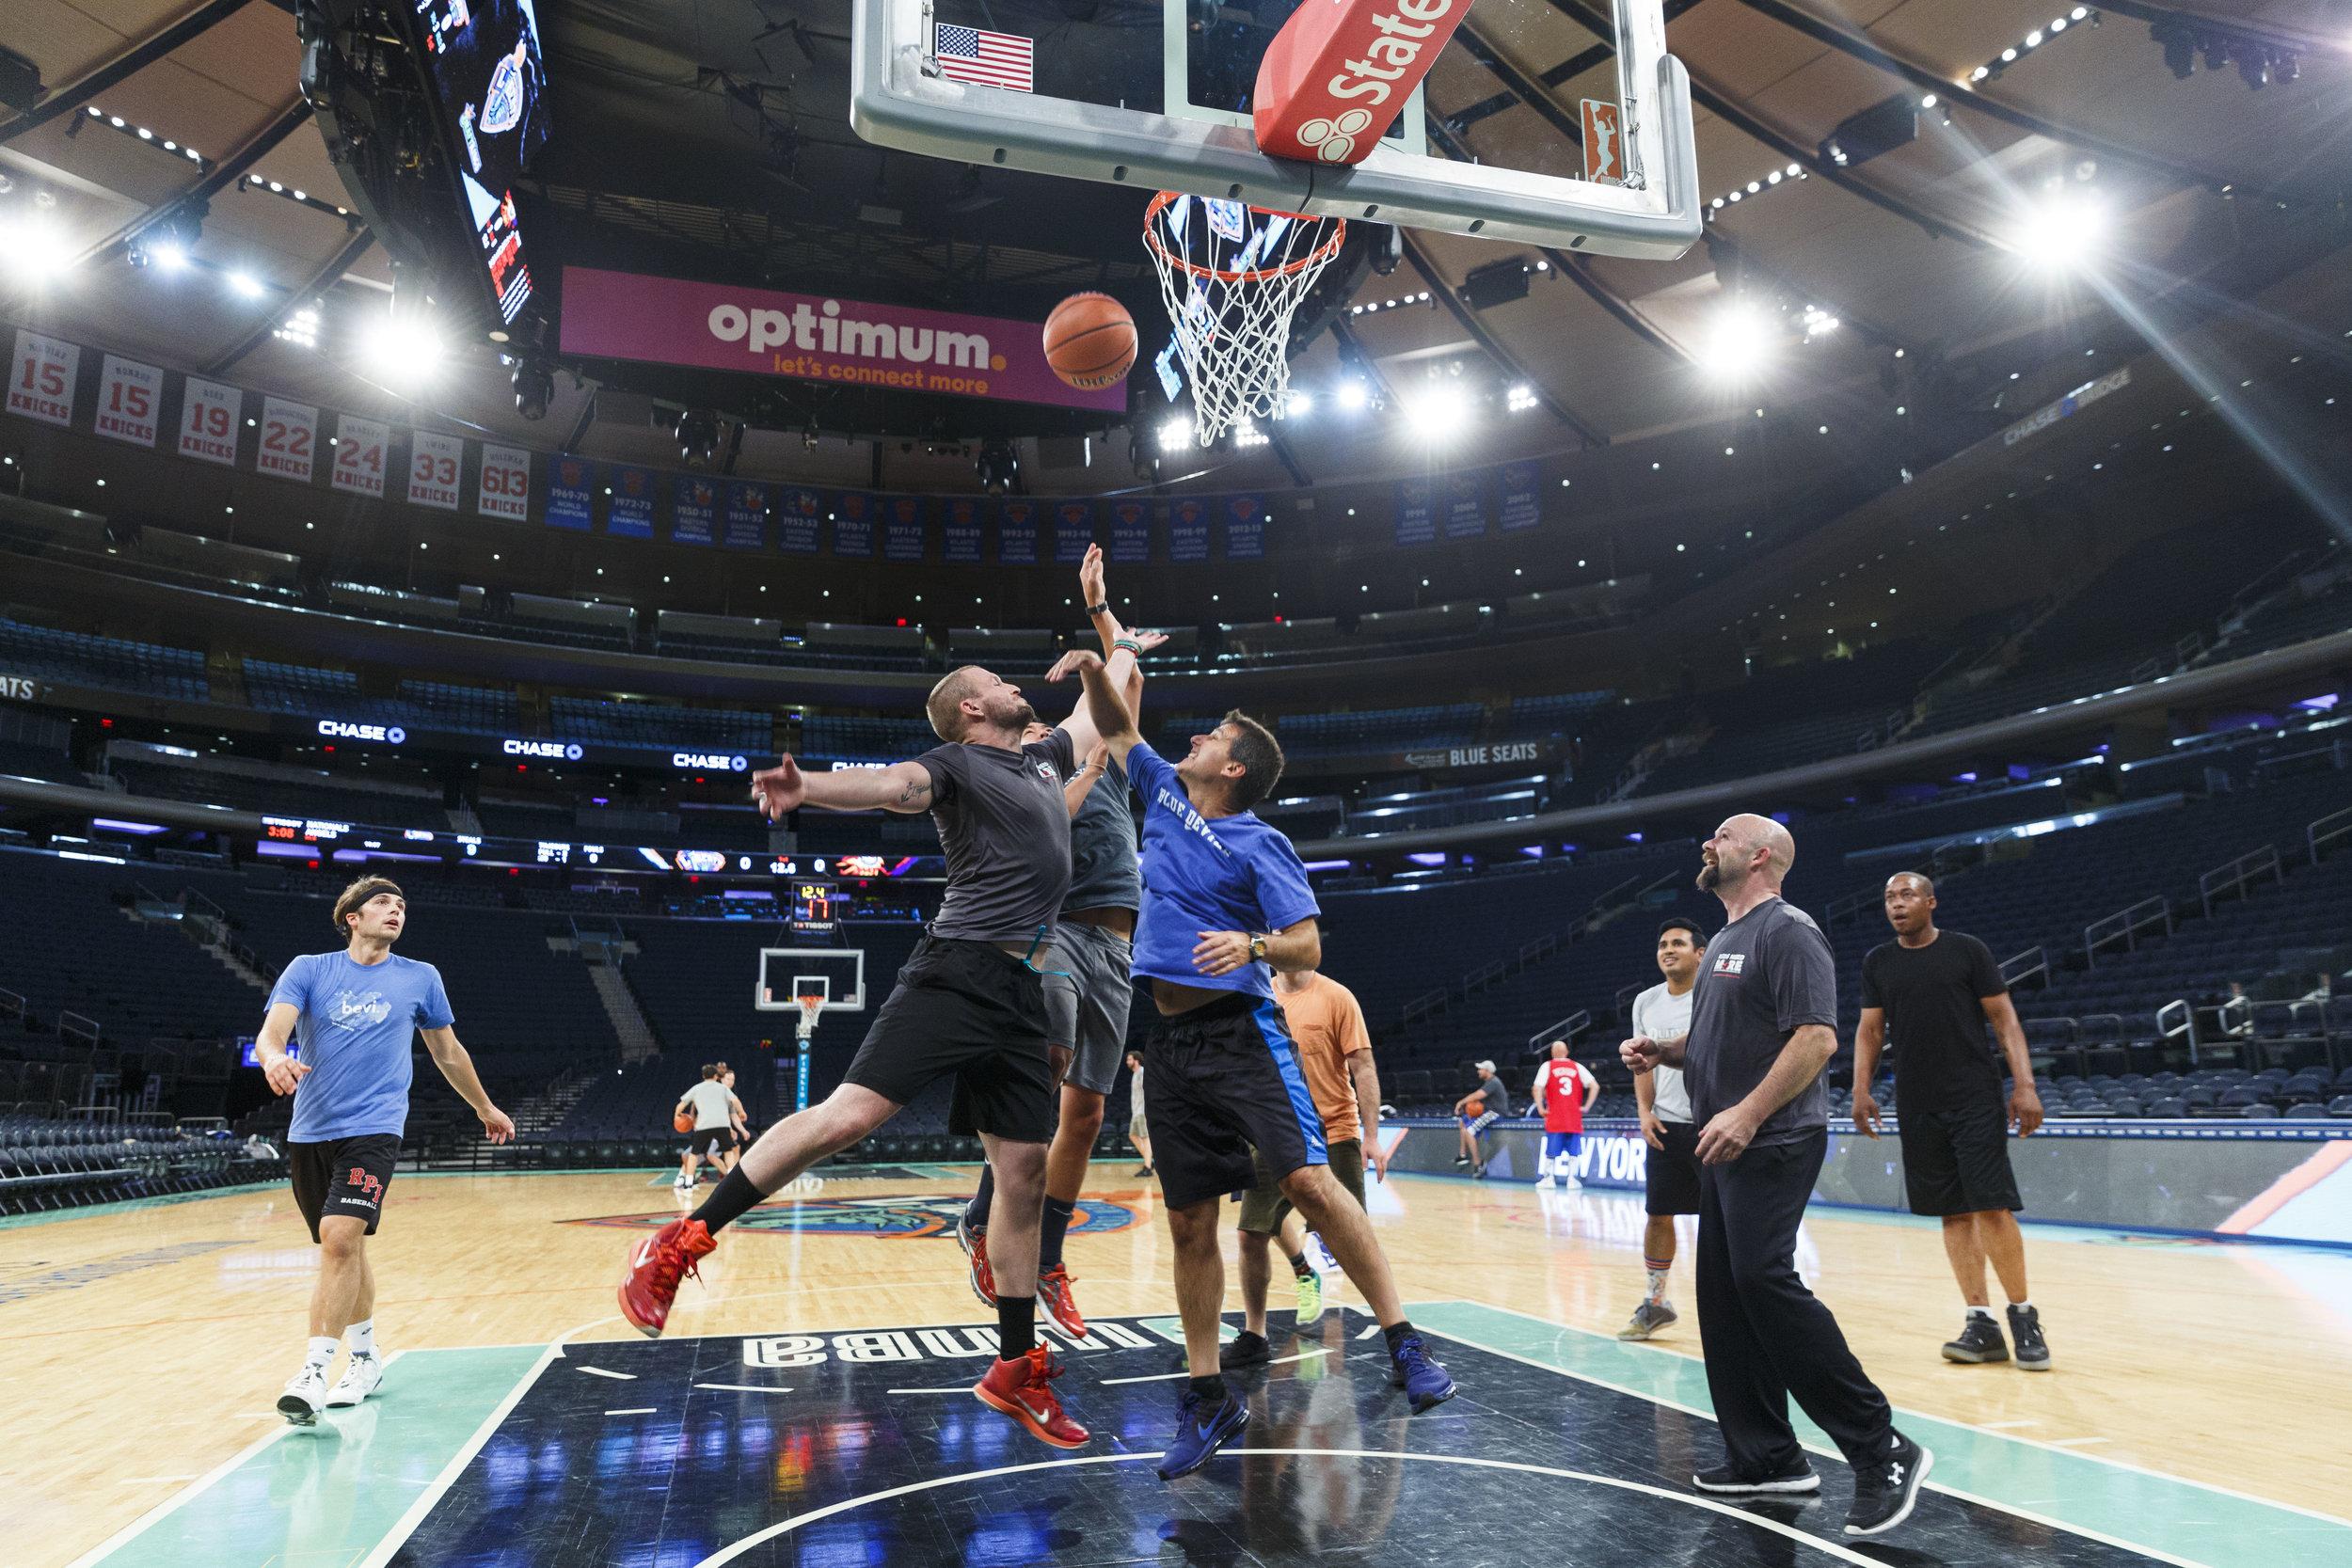 Renting Madison Square Garden